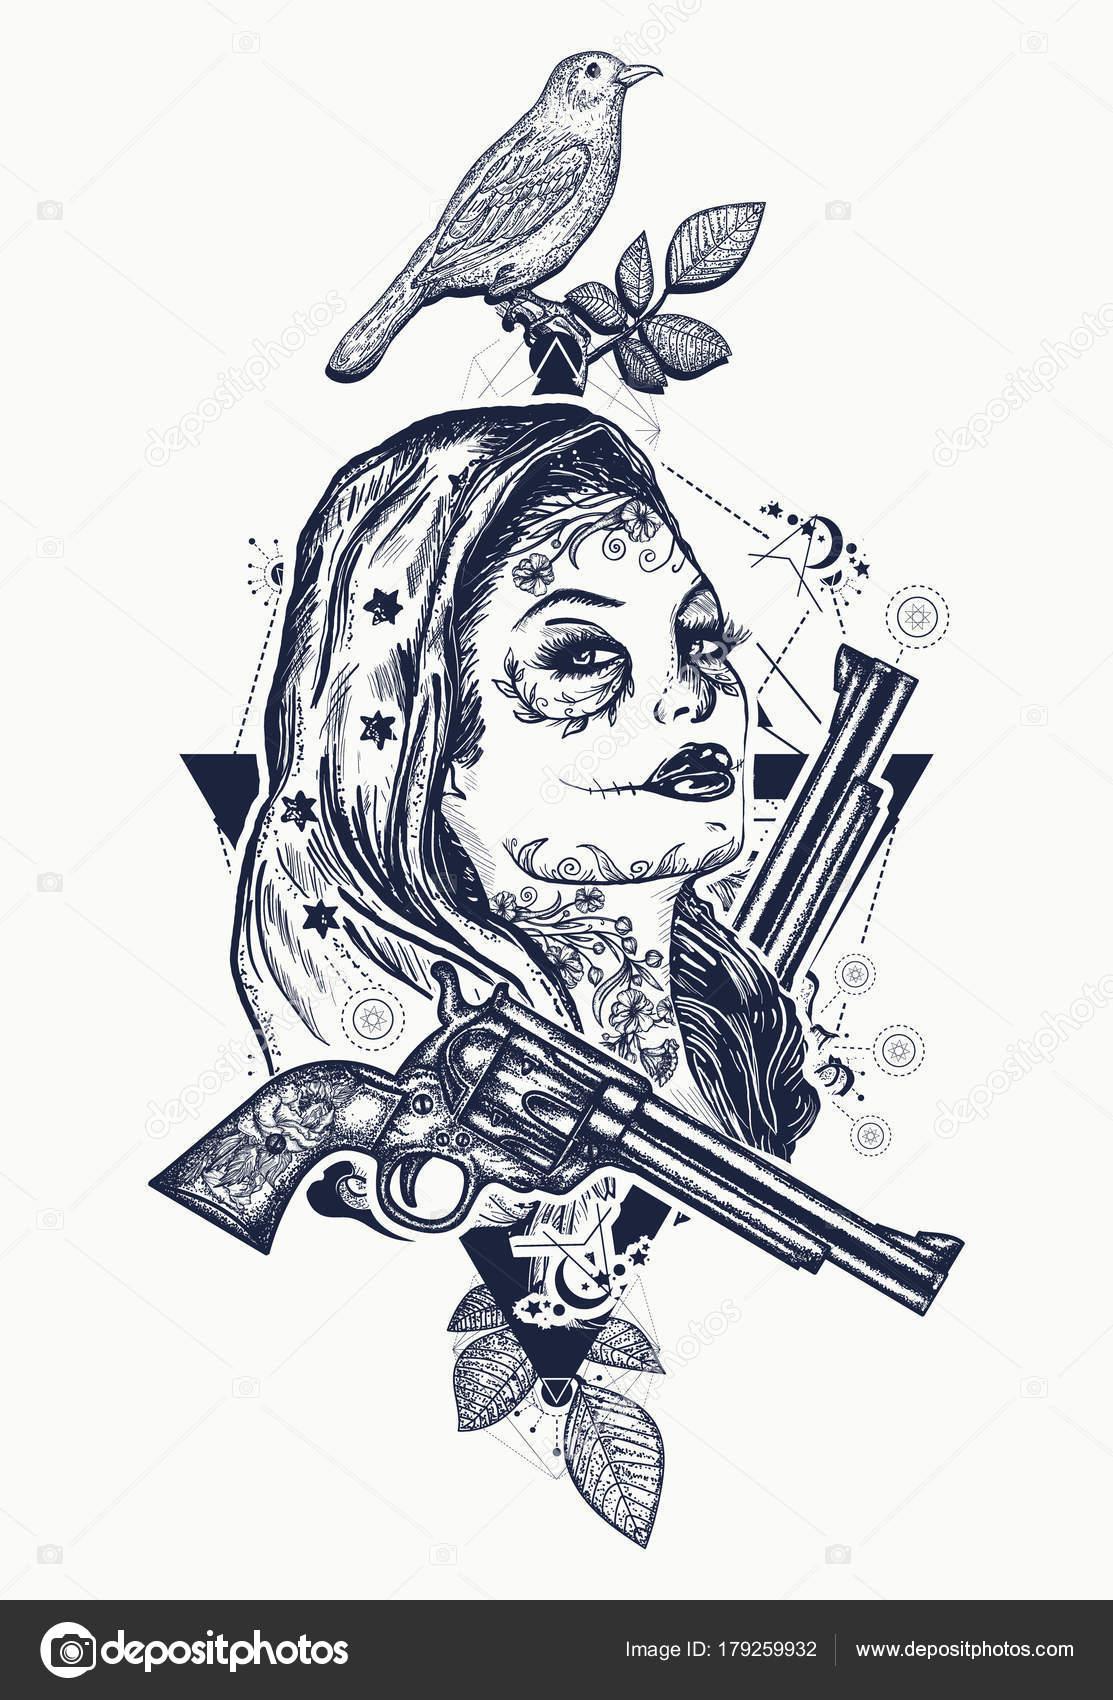 Diseño Arte Camiseta Tatuaje Criminal Mexicana Tatuaje Mujer Salvaje